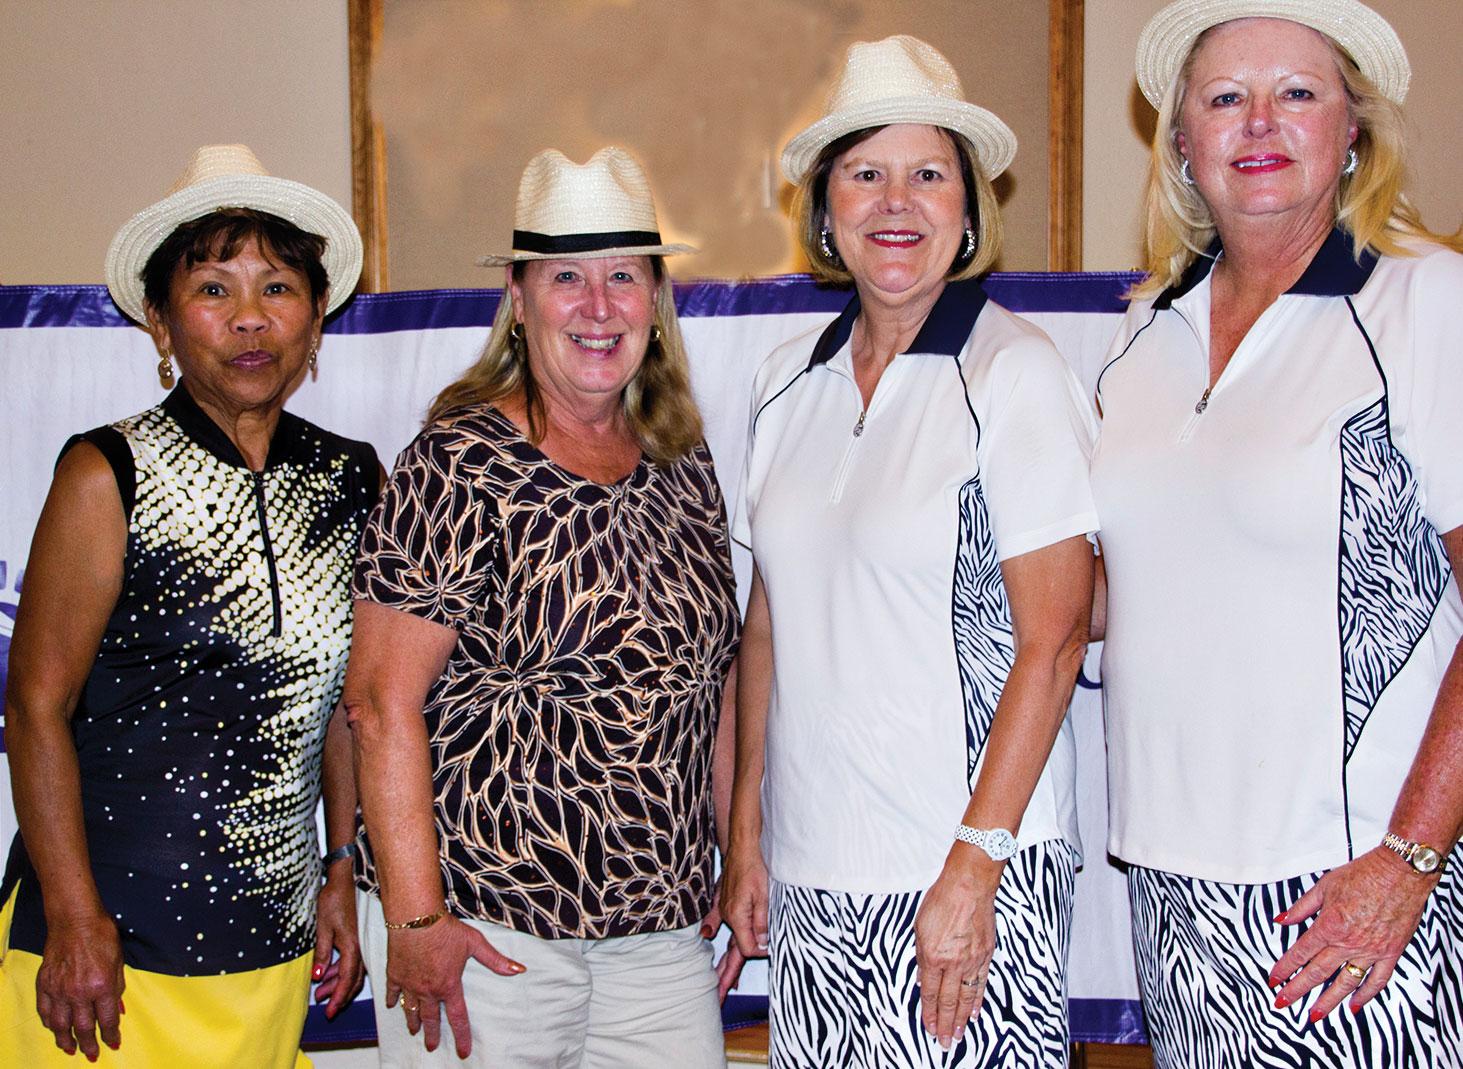 Bow Tie Winners: Angie Denahan, Gloria Belanger, Charlene Leach and Kay Cruise